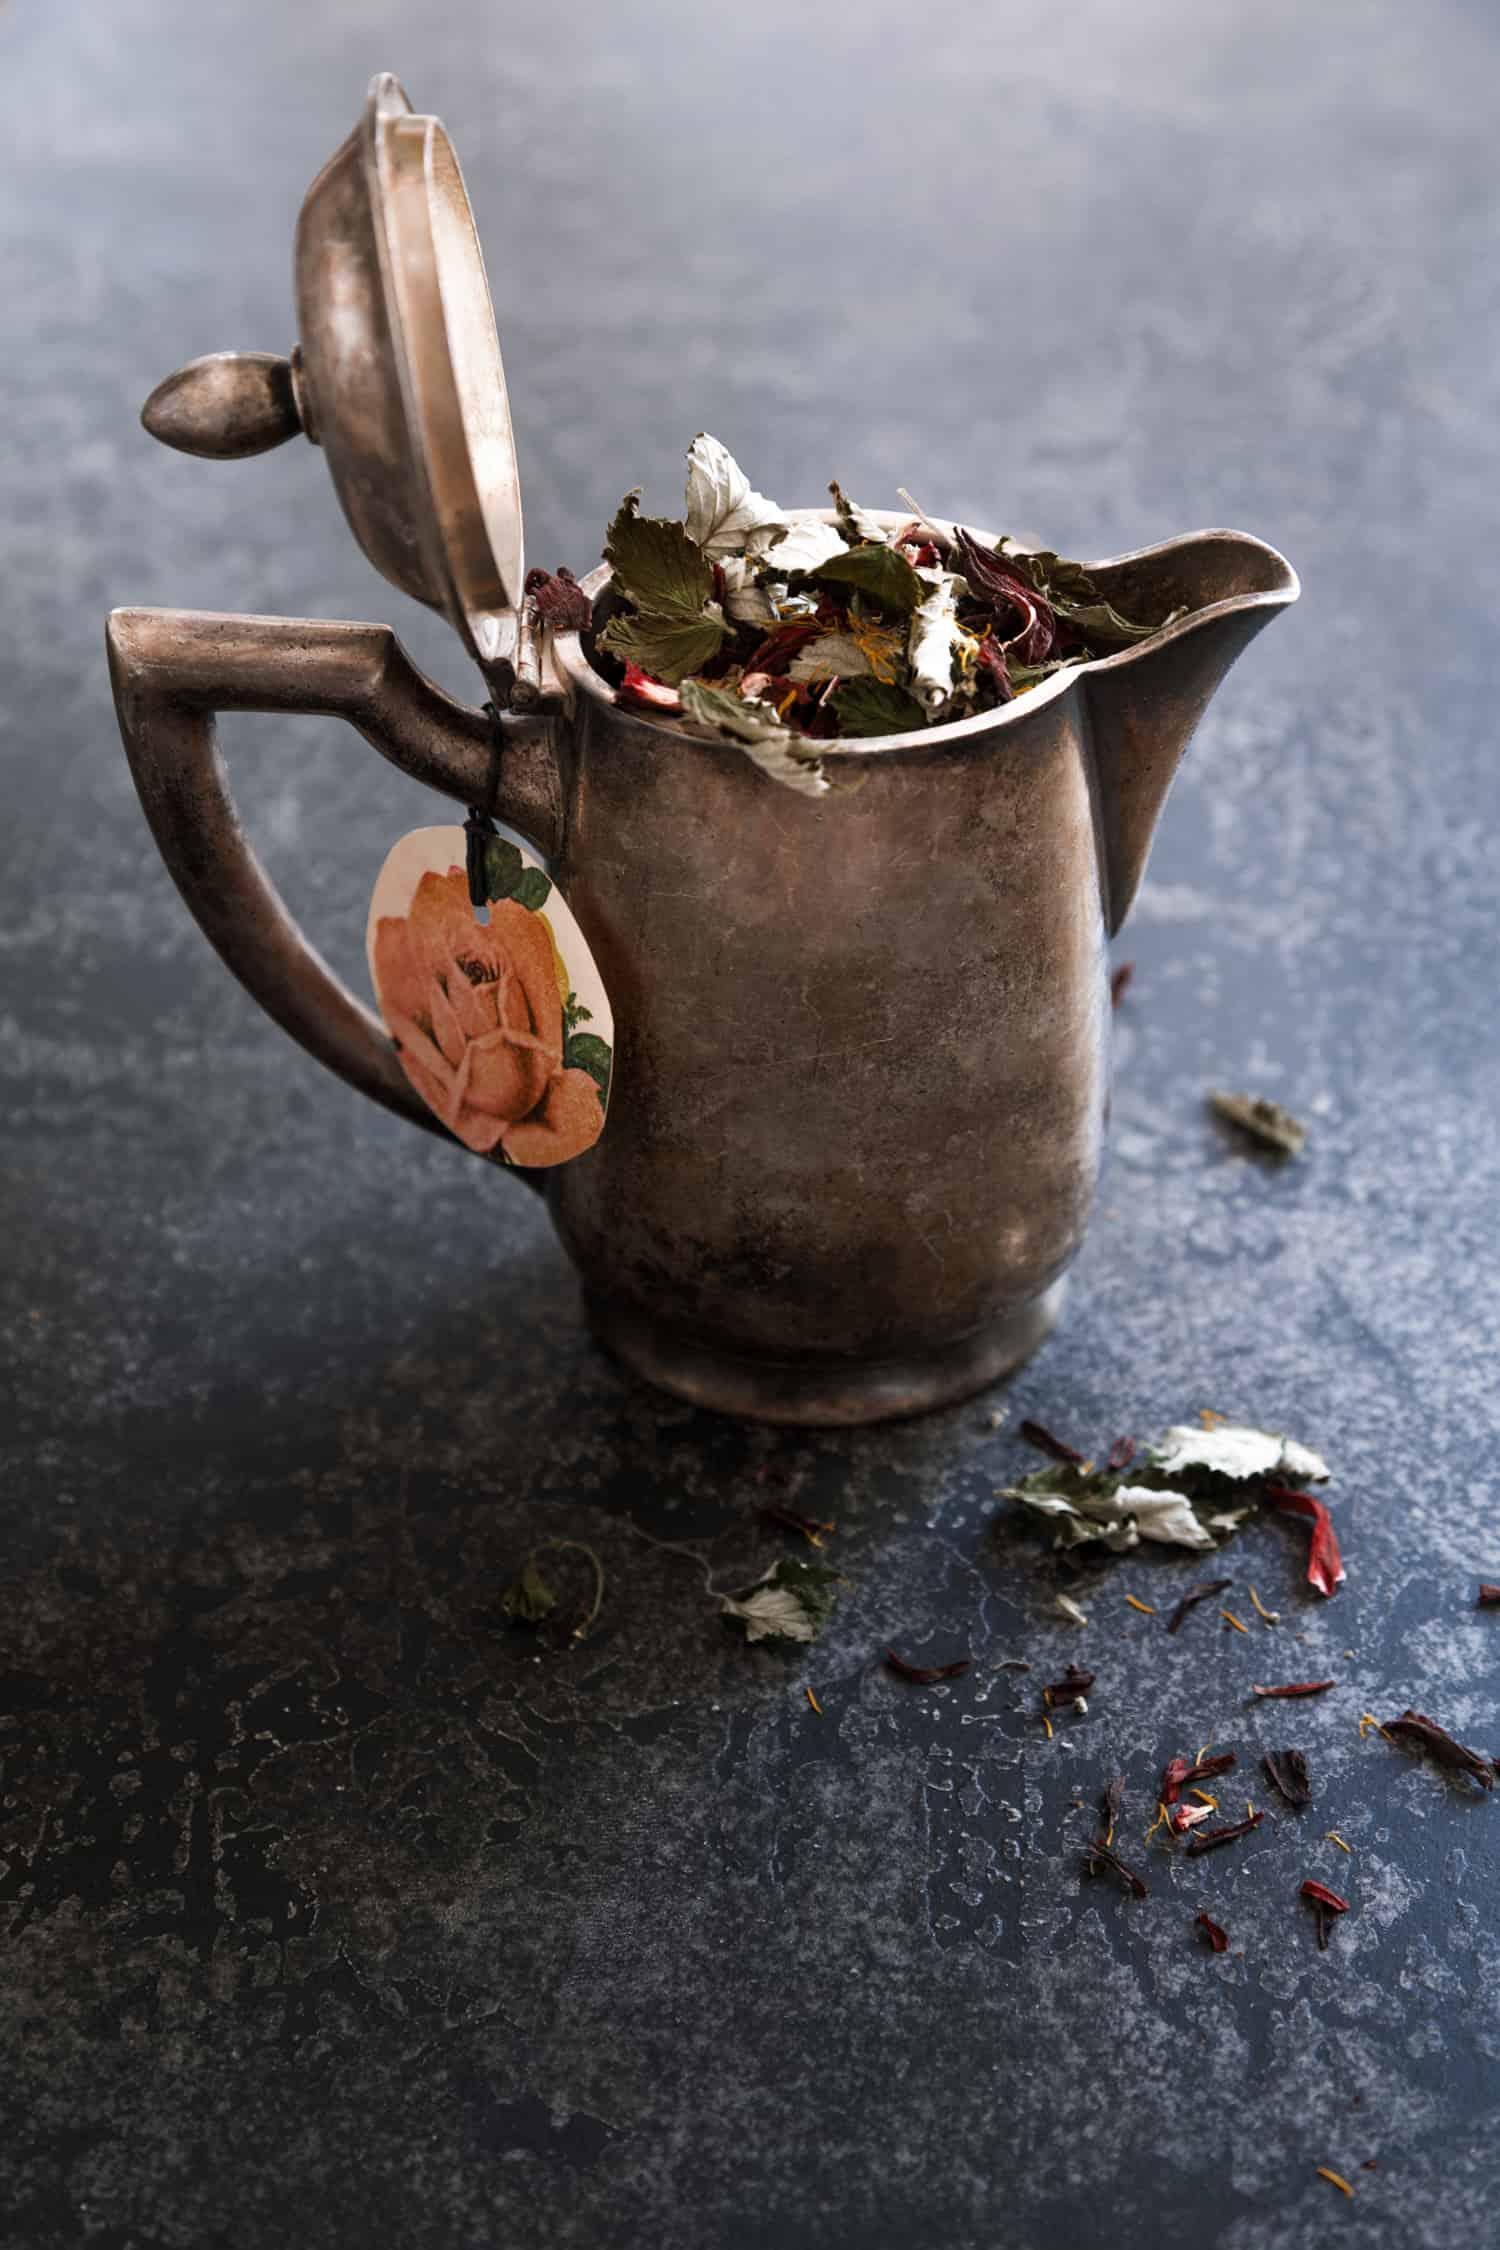 Tea Mari Moilanen